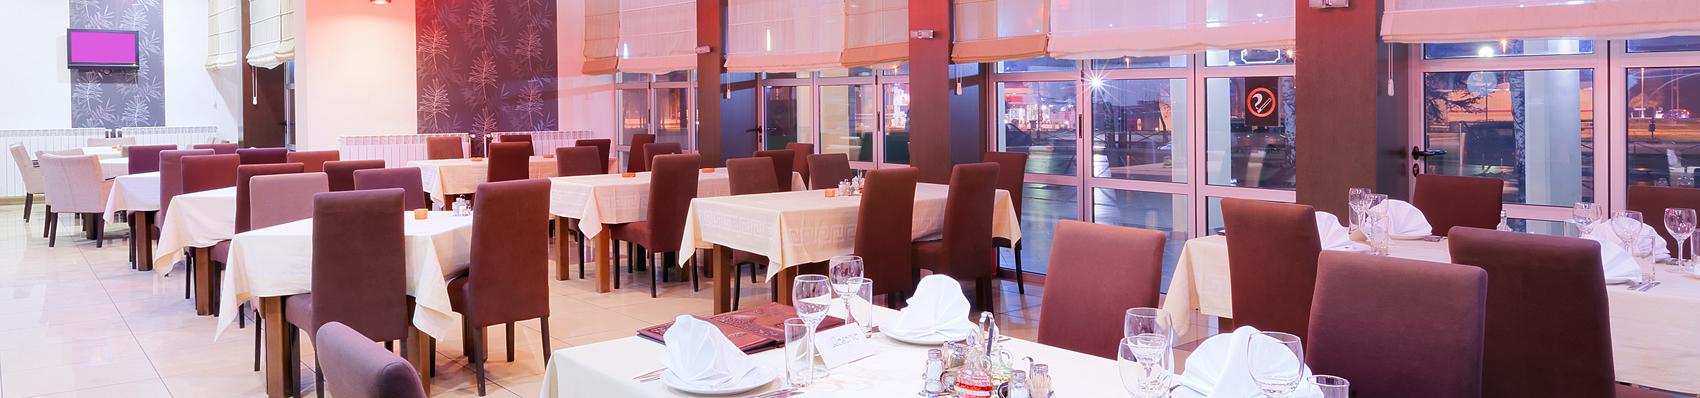 Restaurant Litigation Defense